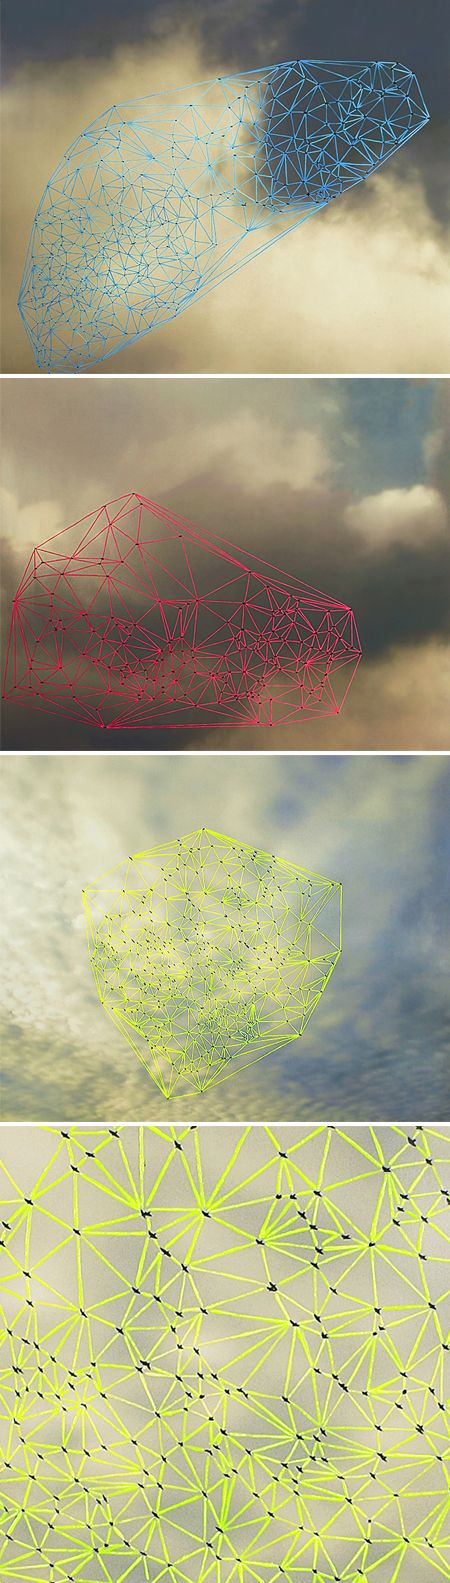 catherine ulitsky - tiny birds in flight, creating massive geometric objects. <3